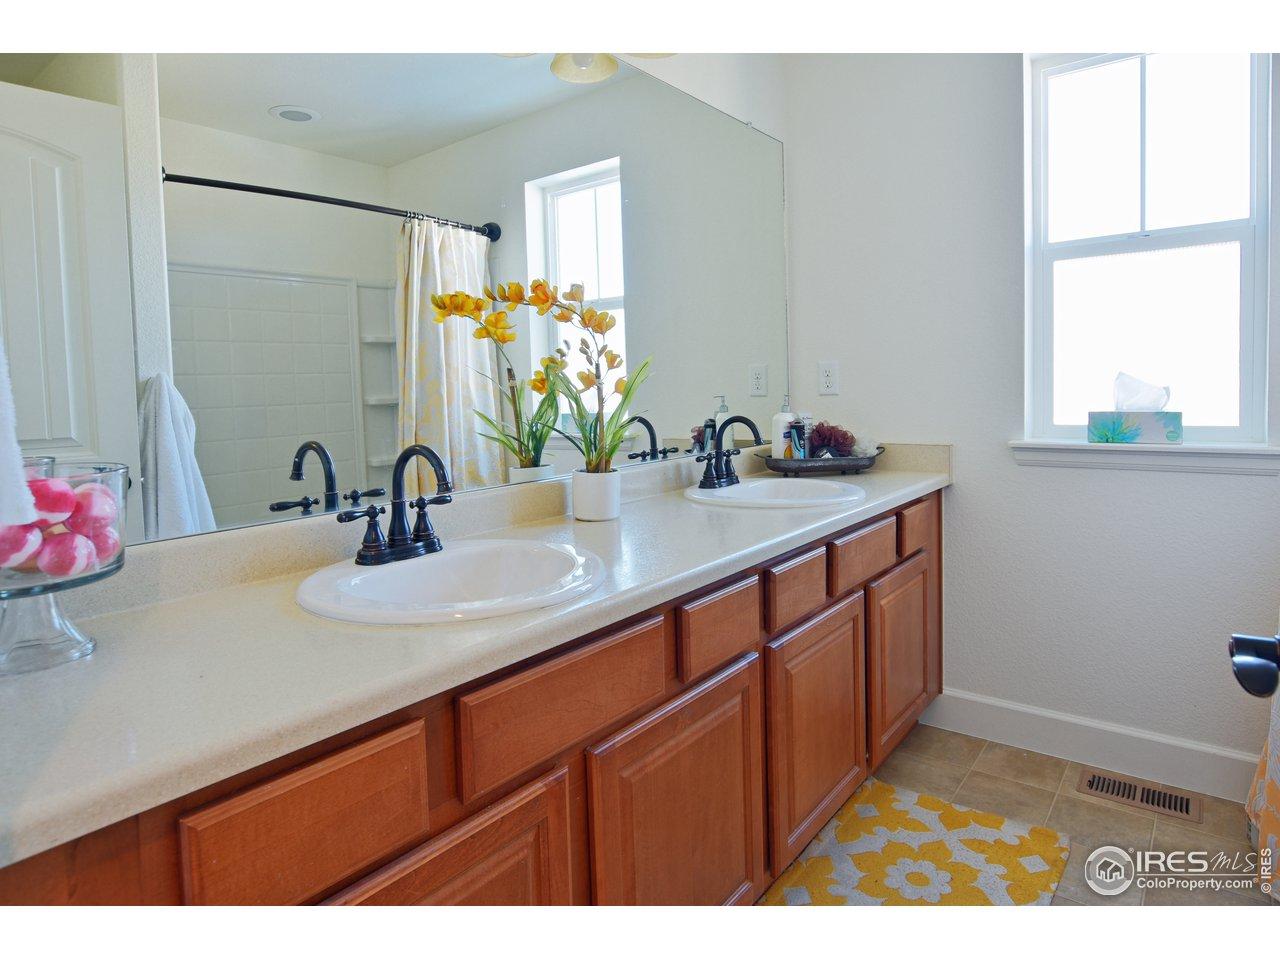 Main bath has double sink